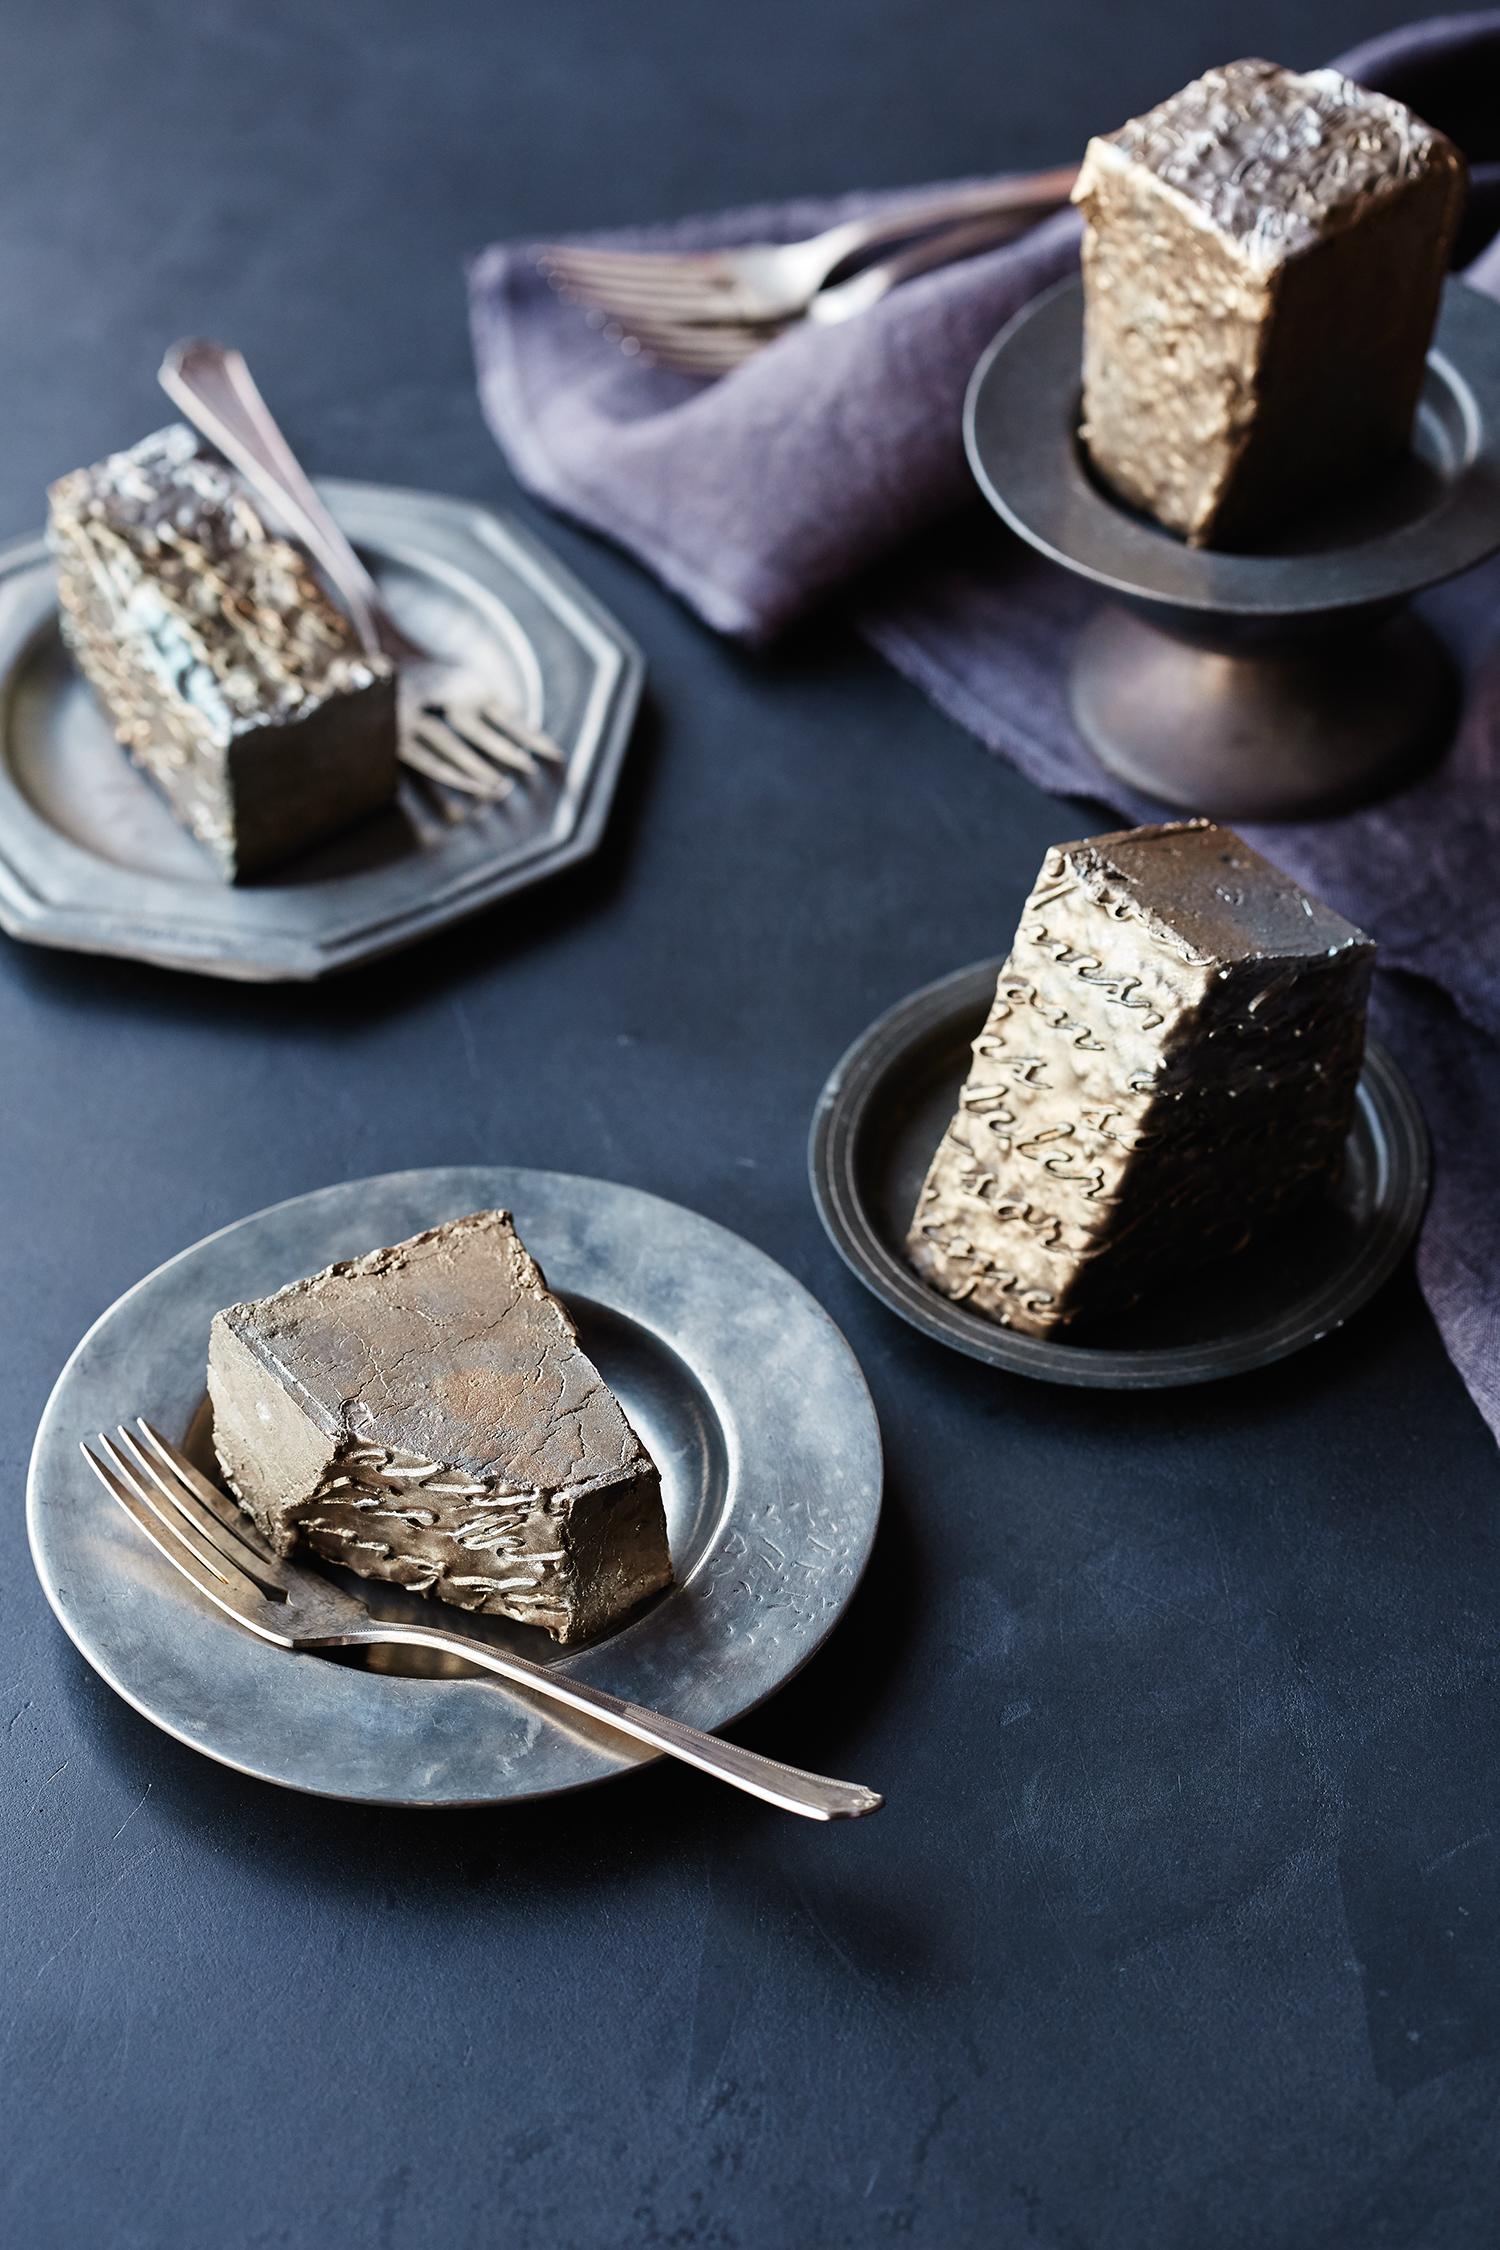 LWC_0617_Desserts_ColinPrice_Love Wins CA26937_RETOUCHED-web.jpg